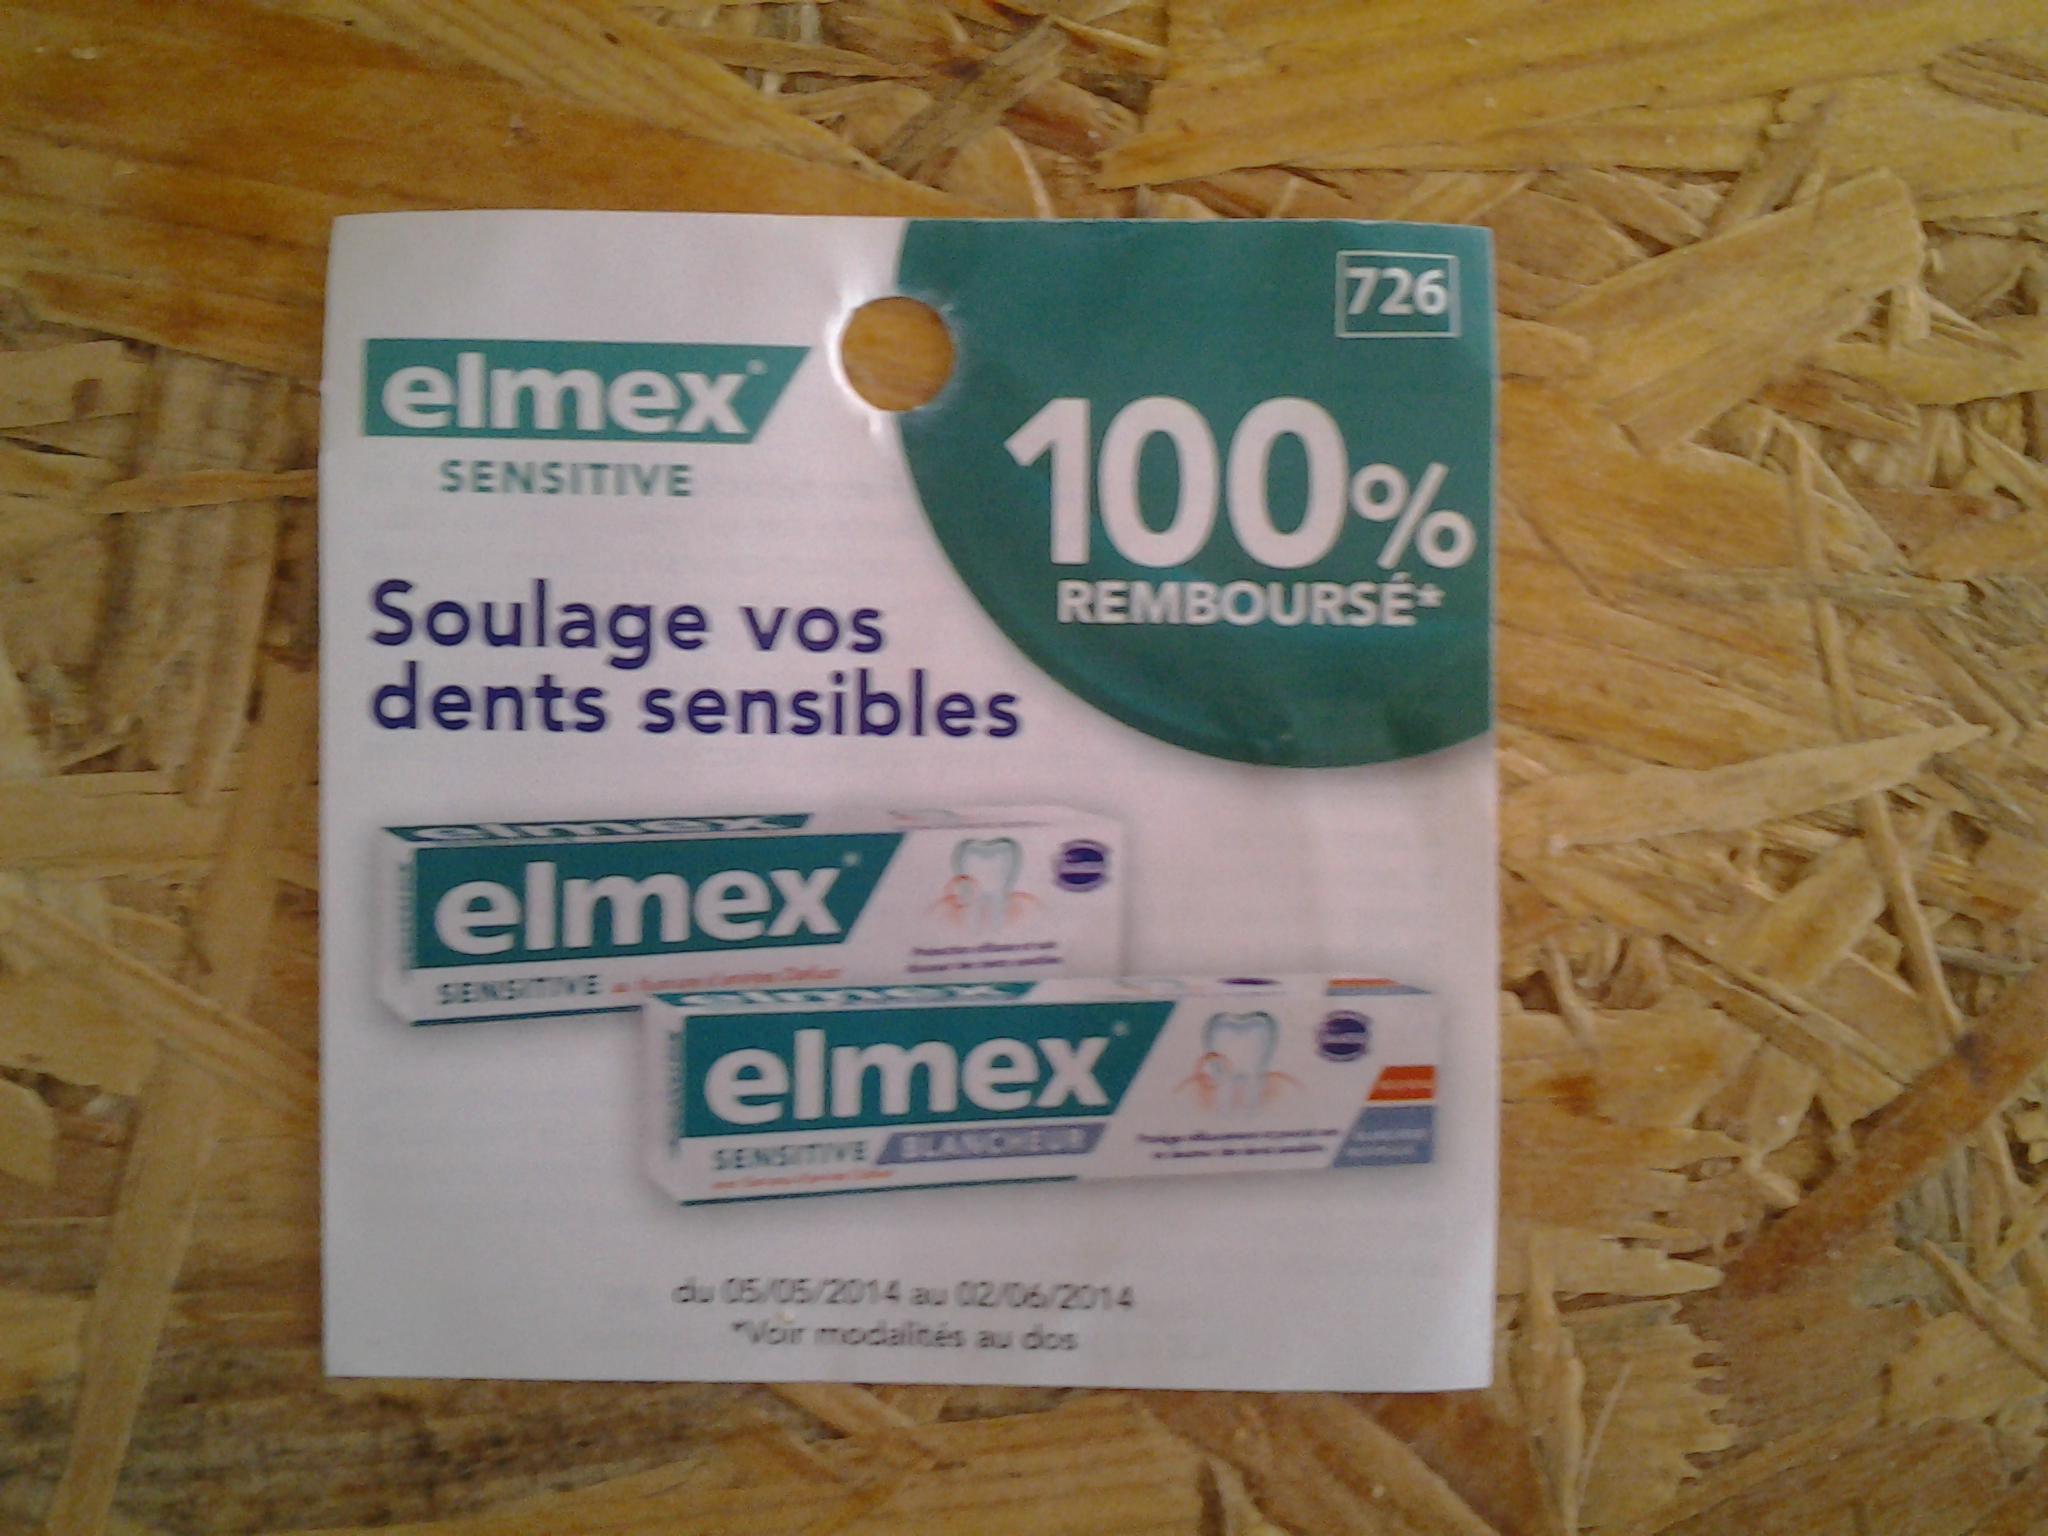 Dentifrice Elmex Sensitive 100% remboursé